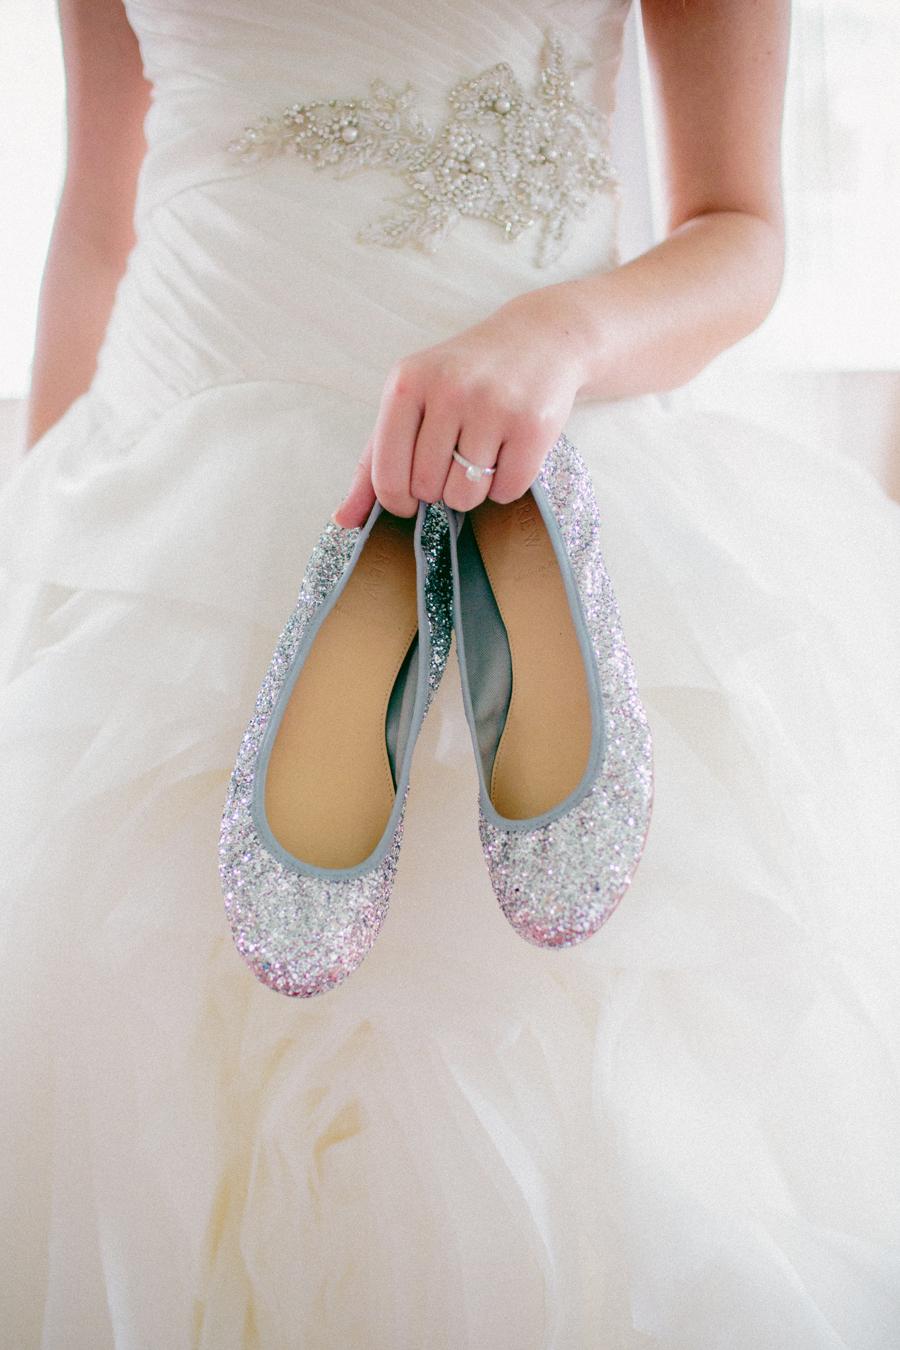 Glitter Ballet Flats Bridal Shoes Elizabeth Anne Designs